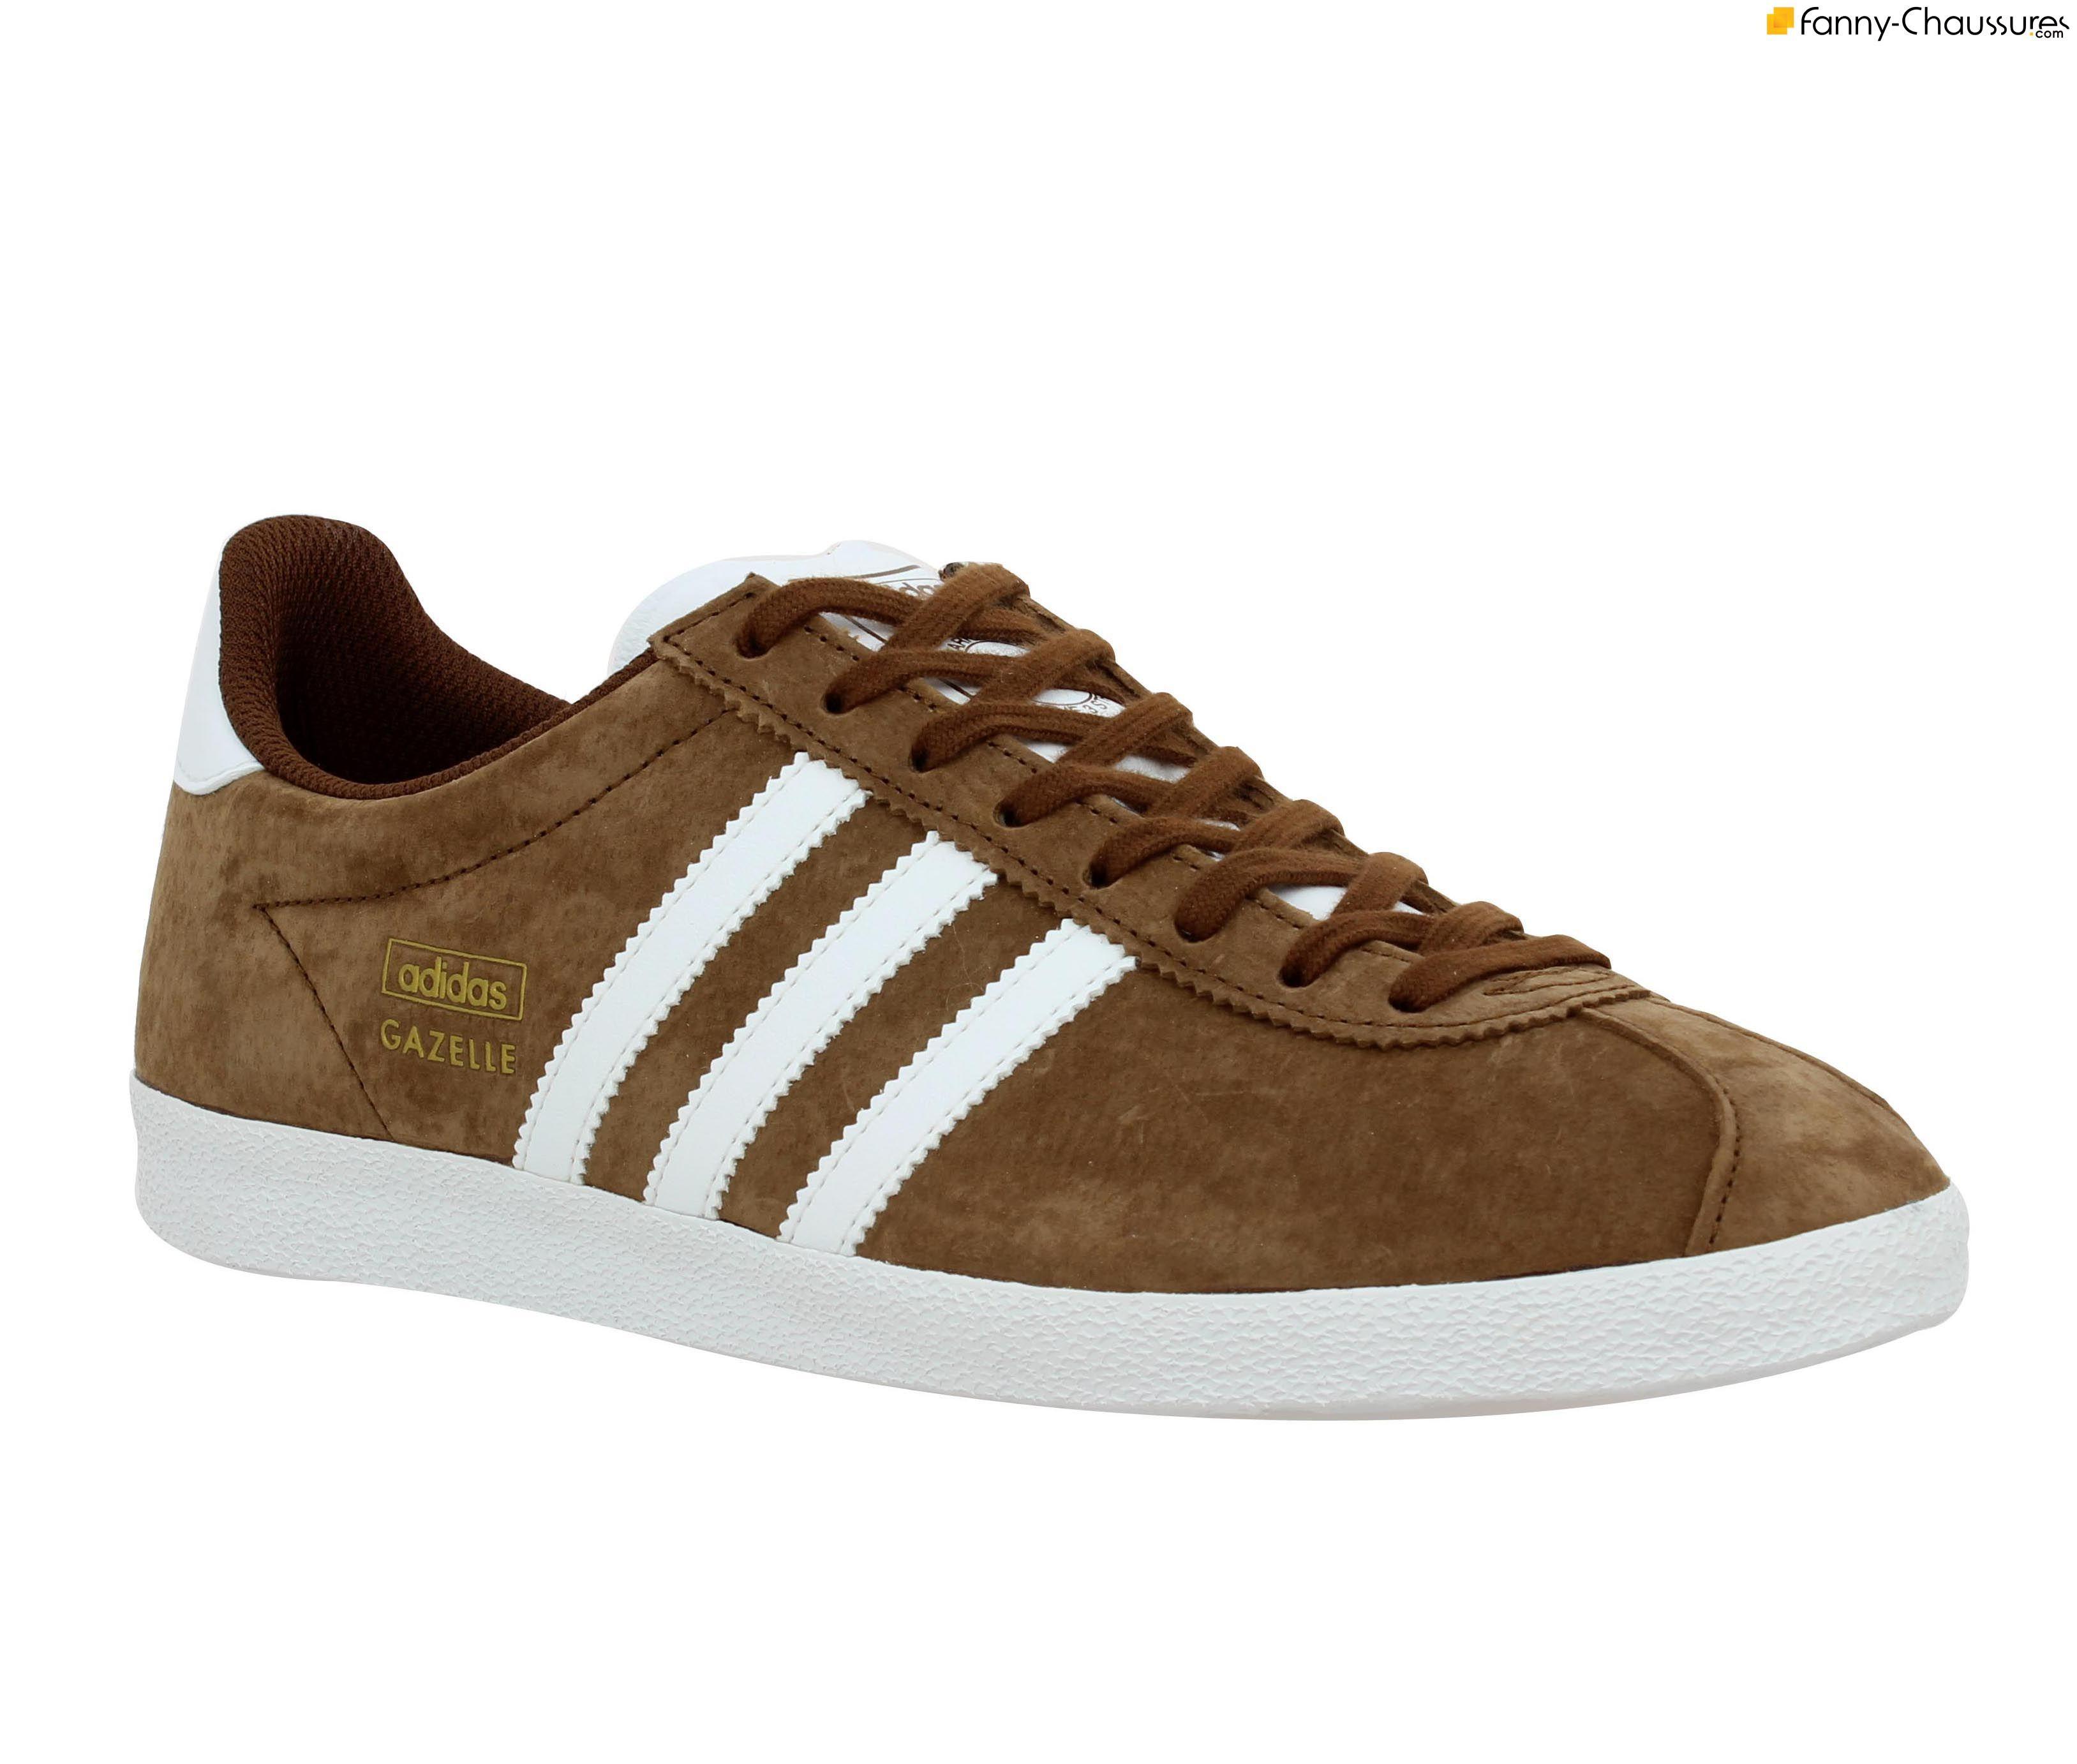 ADIDAS Gazelle velours Homme Marron + Blanc. Adidas GazelleTennisBaskets